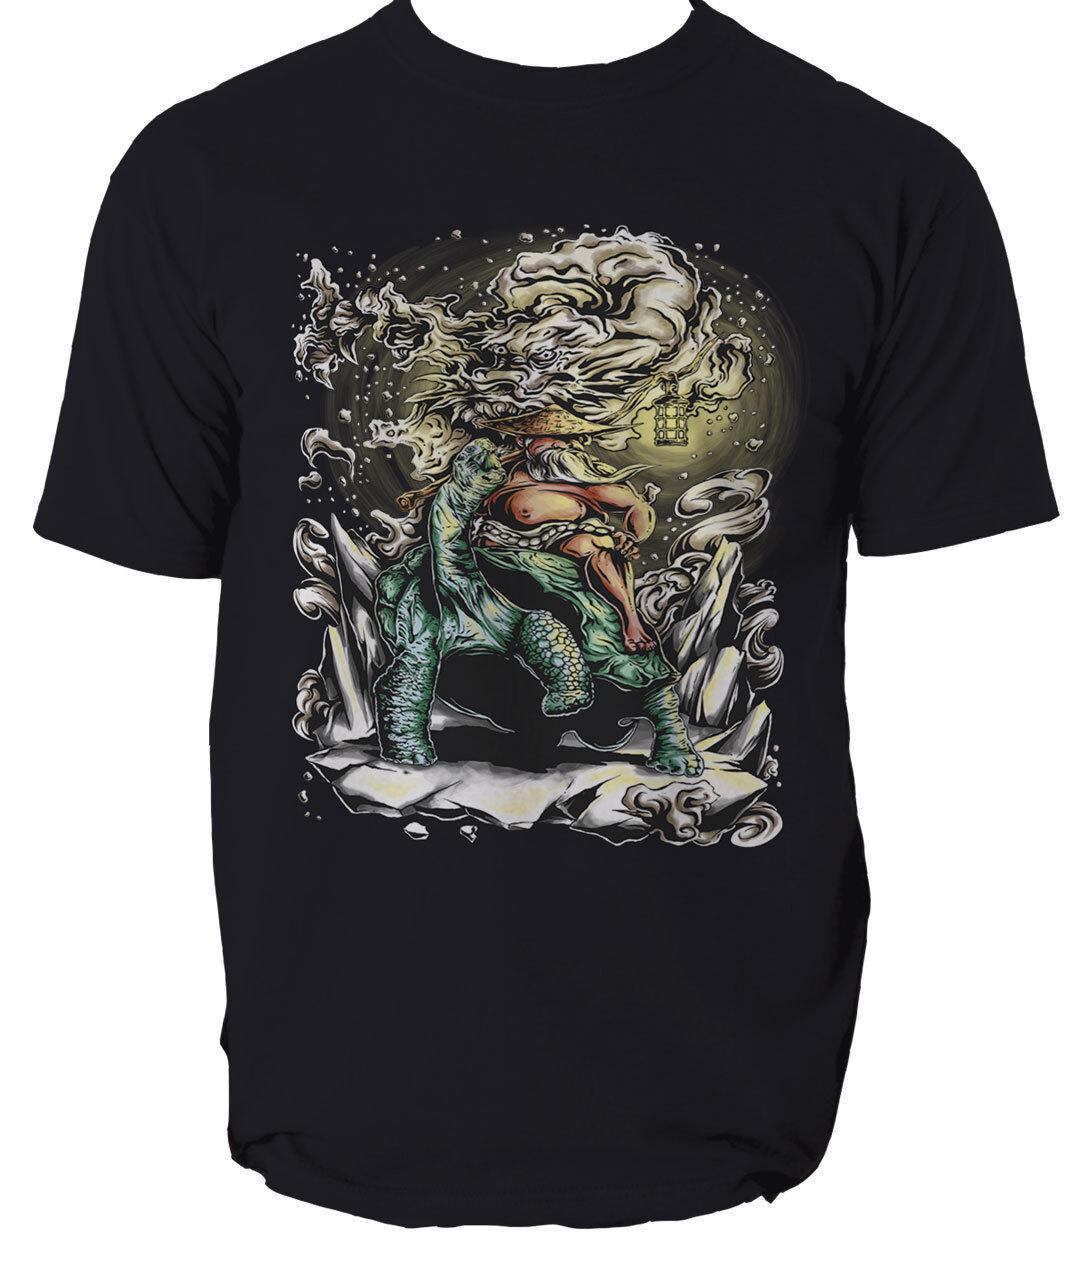 LE SAGE vieillard T Shirt Arts Dragon Comics Arts Shirt Martiaux T-shirt homme tee S-3XL c3fd20